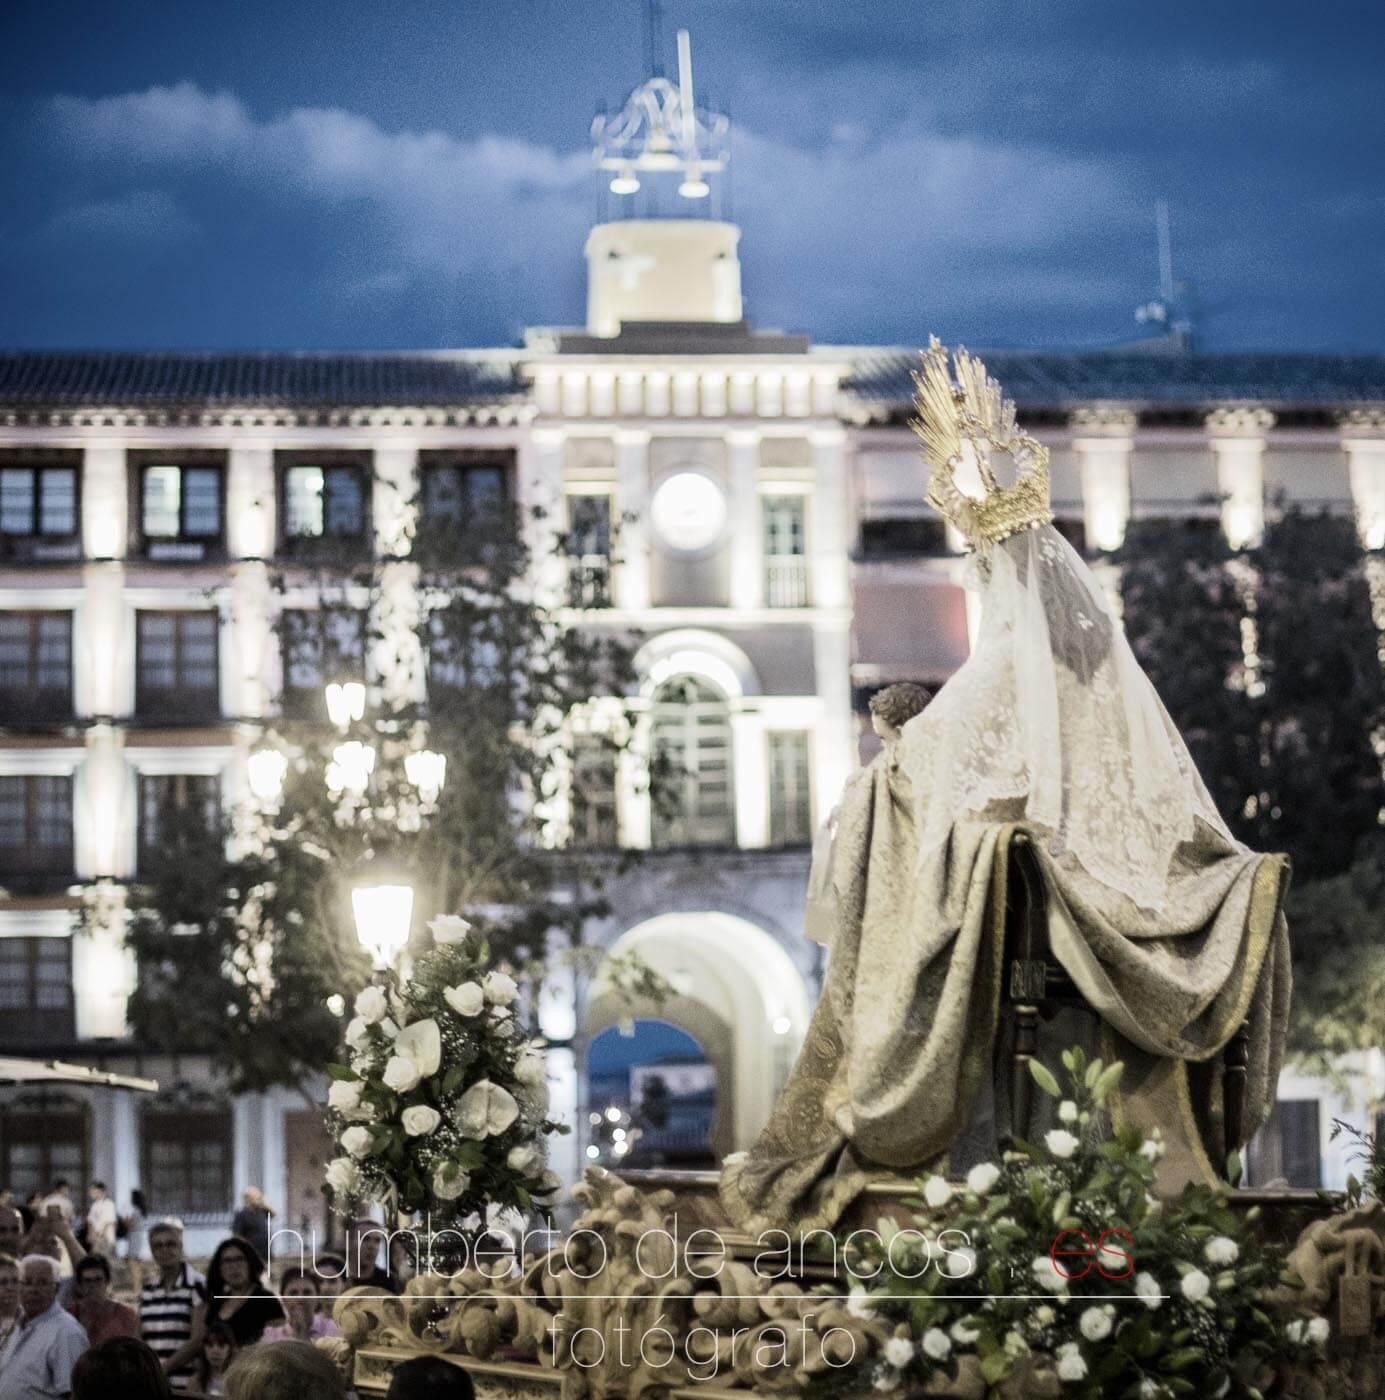 Humberto de Ancos, fotógrafo profesional, Toledo, fotografo de bodas Toledo, fotógrafo de comuniones Toledo, fotógrafo de eventos Toledo